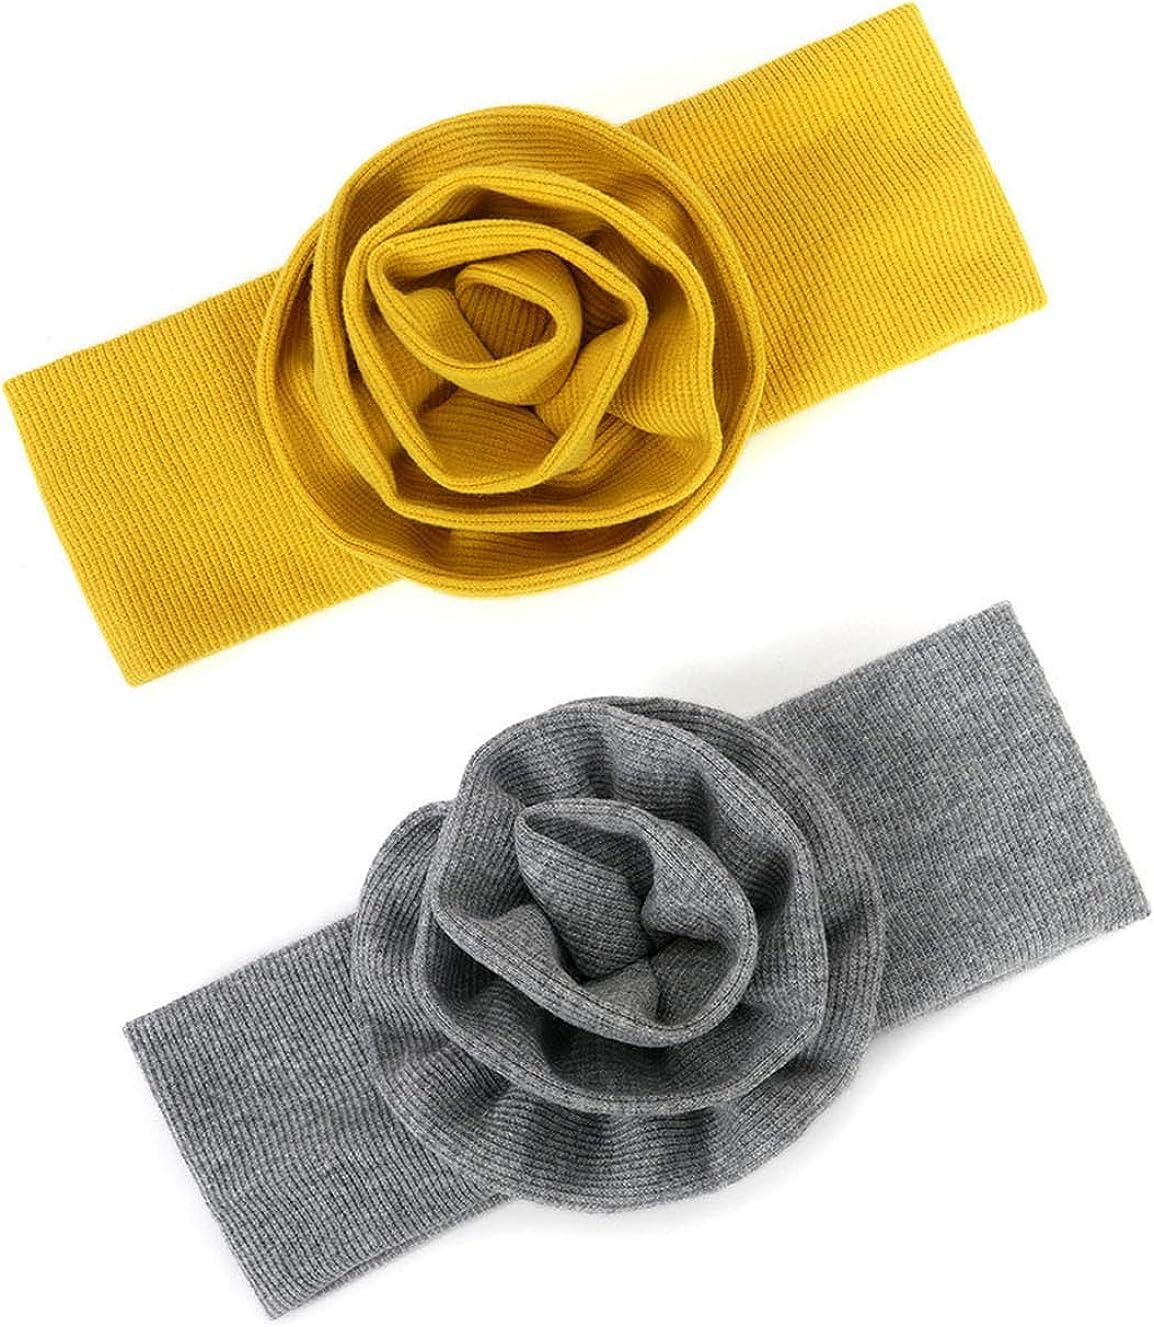 YONGYAN 2 PCS Baby National products Girl Big Max 47% OFF Flower Headbands Soft Bands Elastics